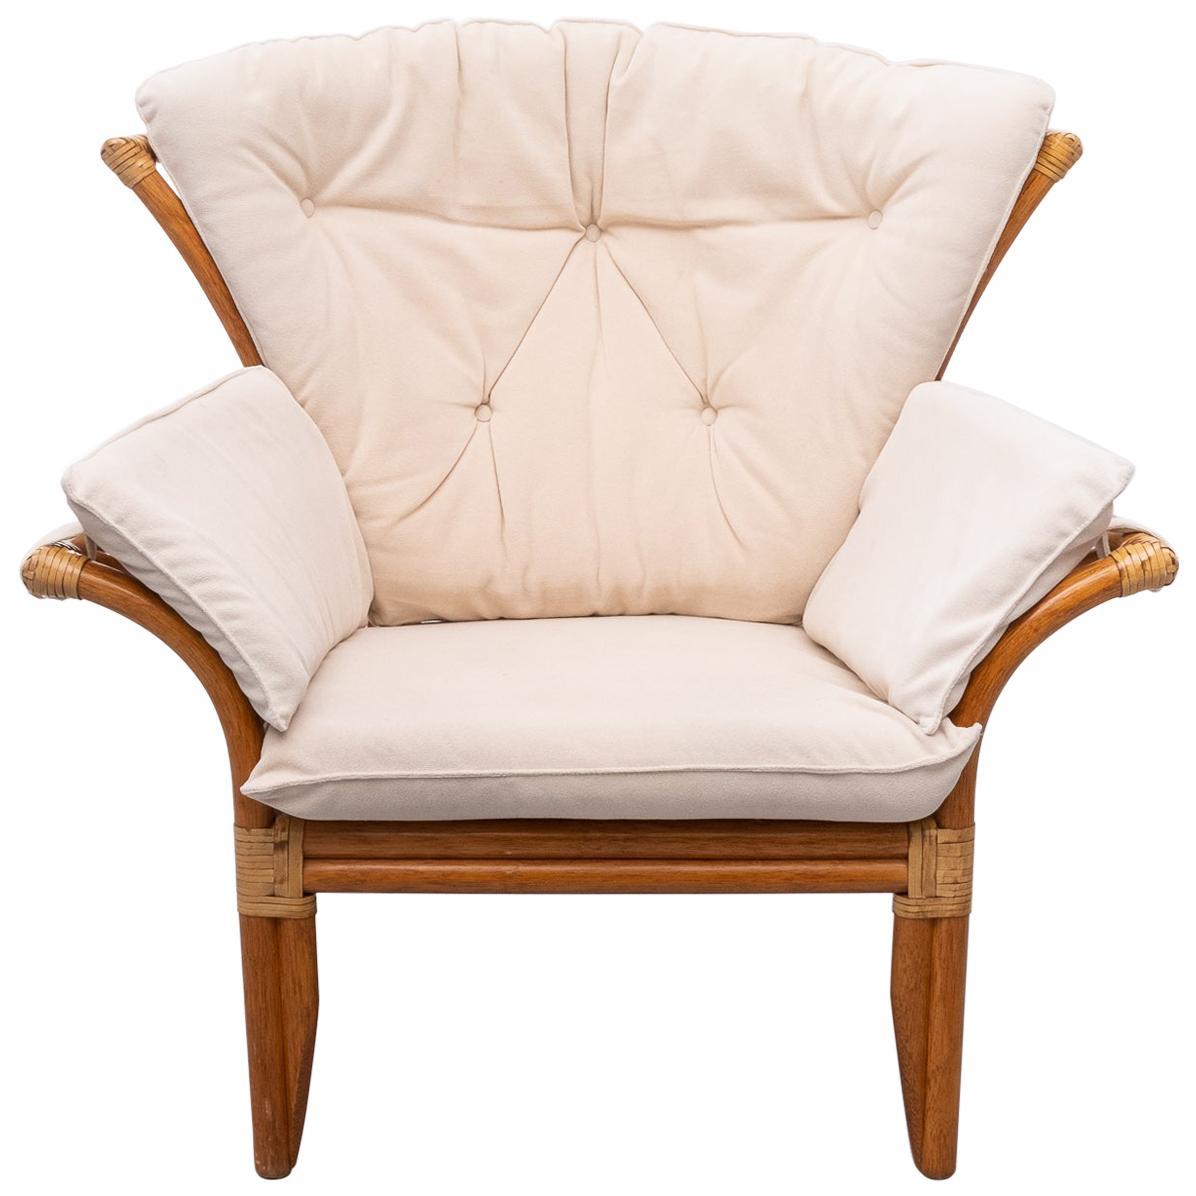 Vintage Rattan Lounge Chair, Italian, 1980s